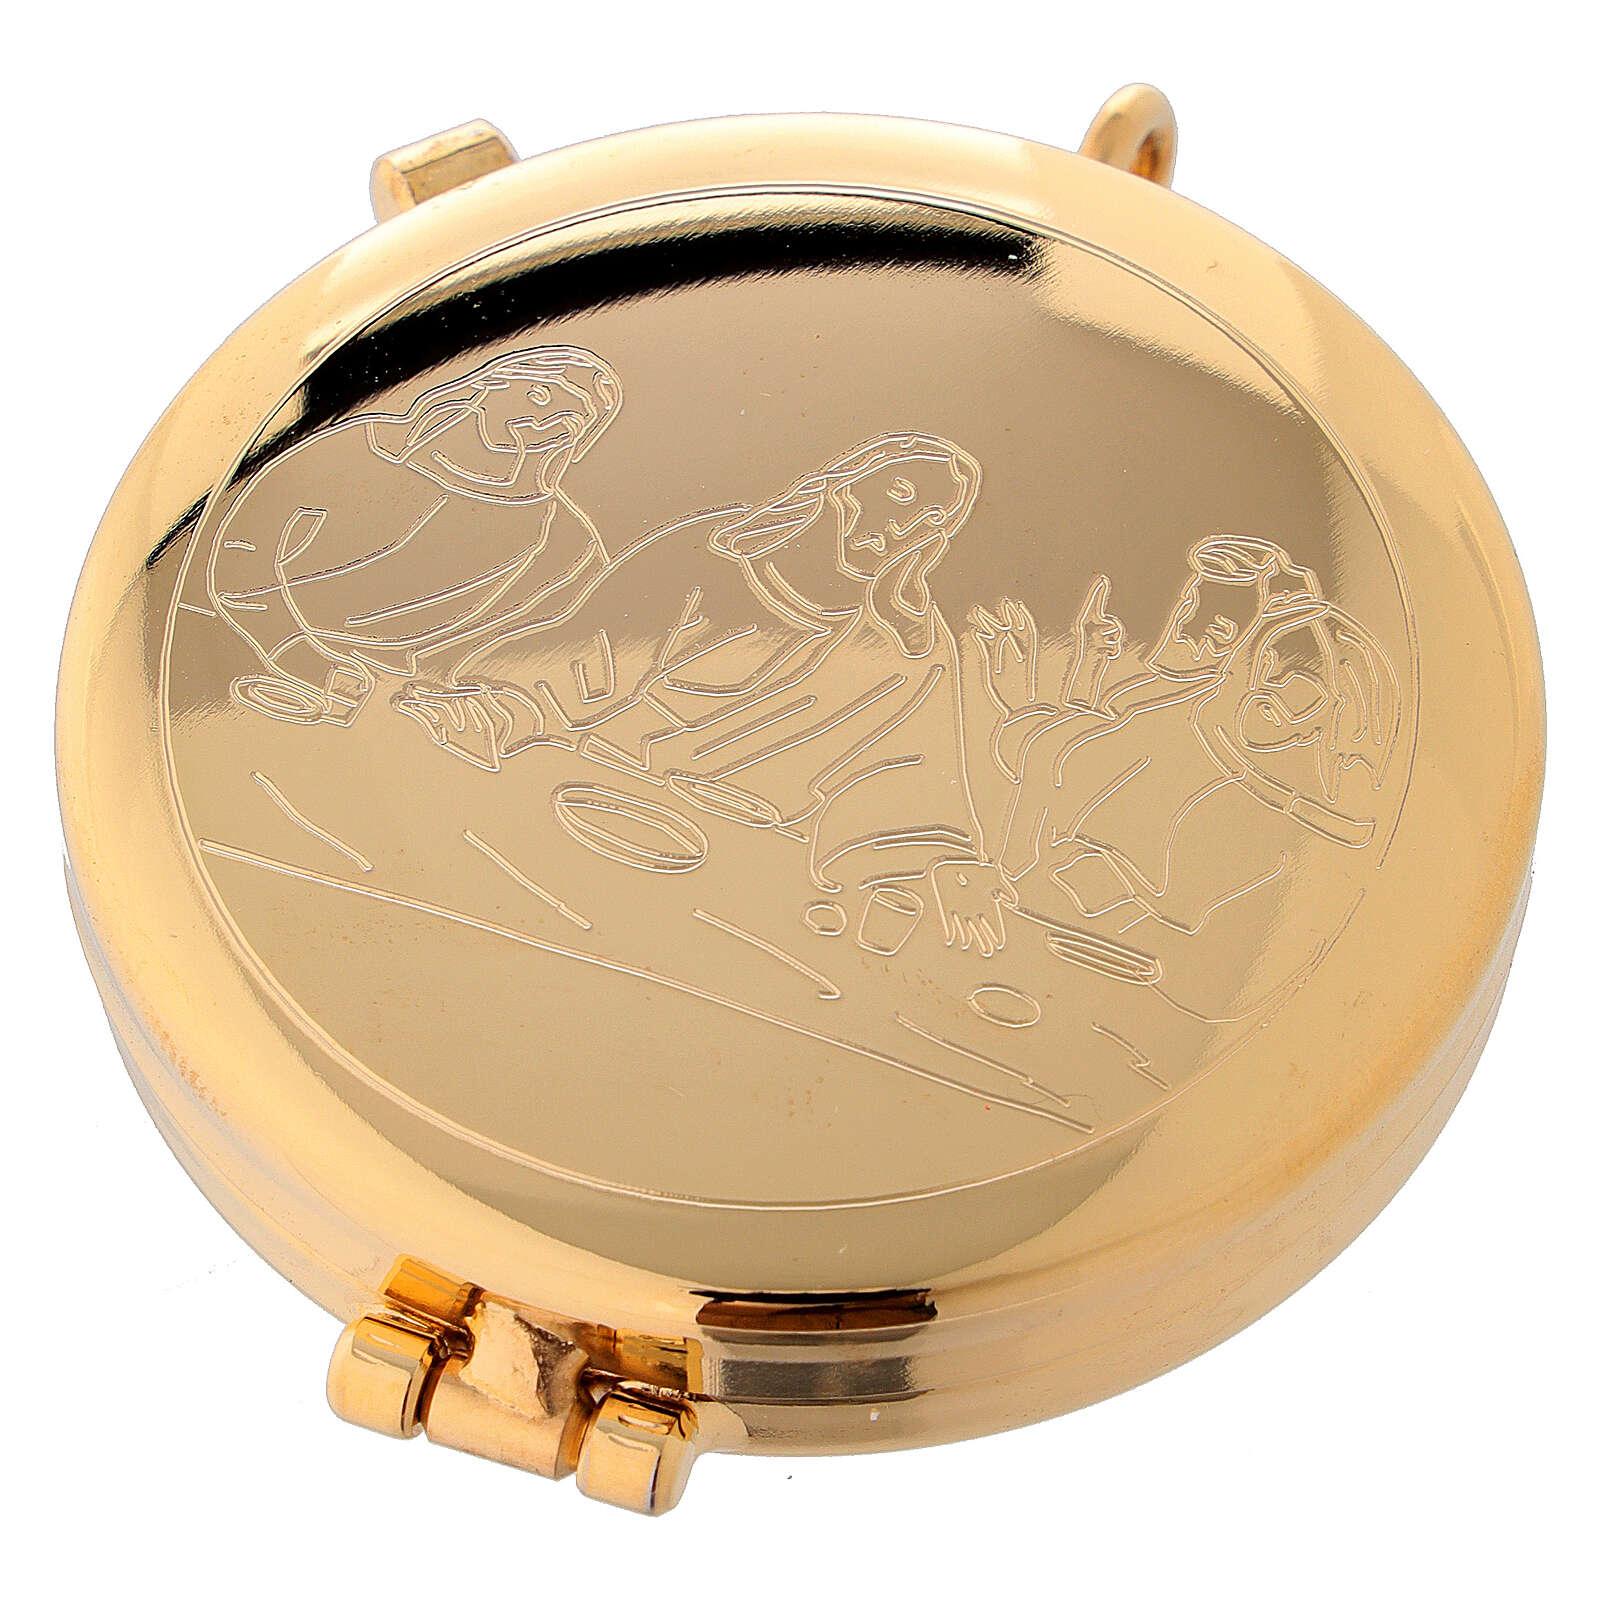 Relicario eucarístico dorado con incisión Última cena5,3 cm 3